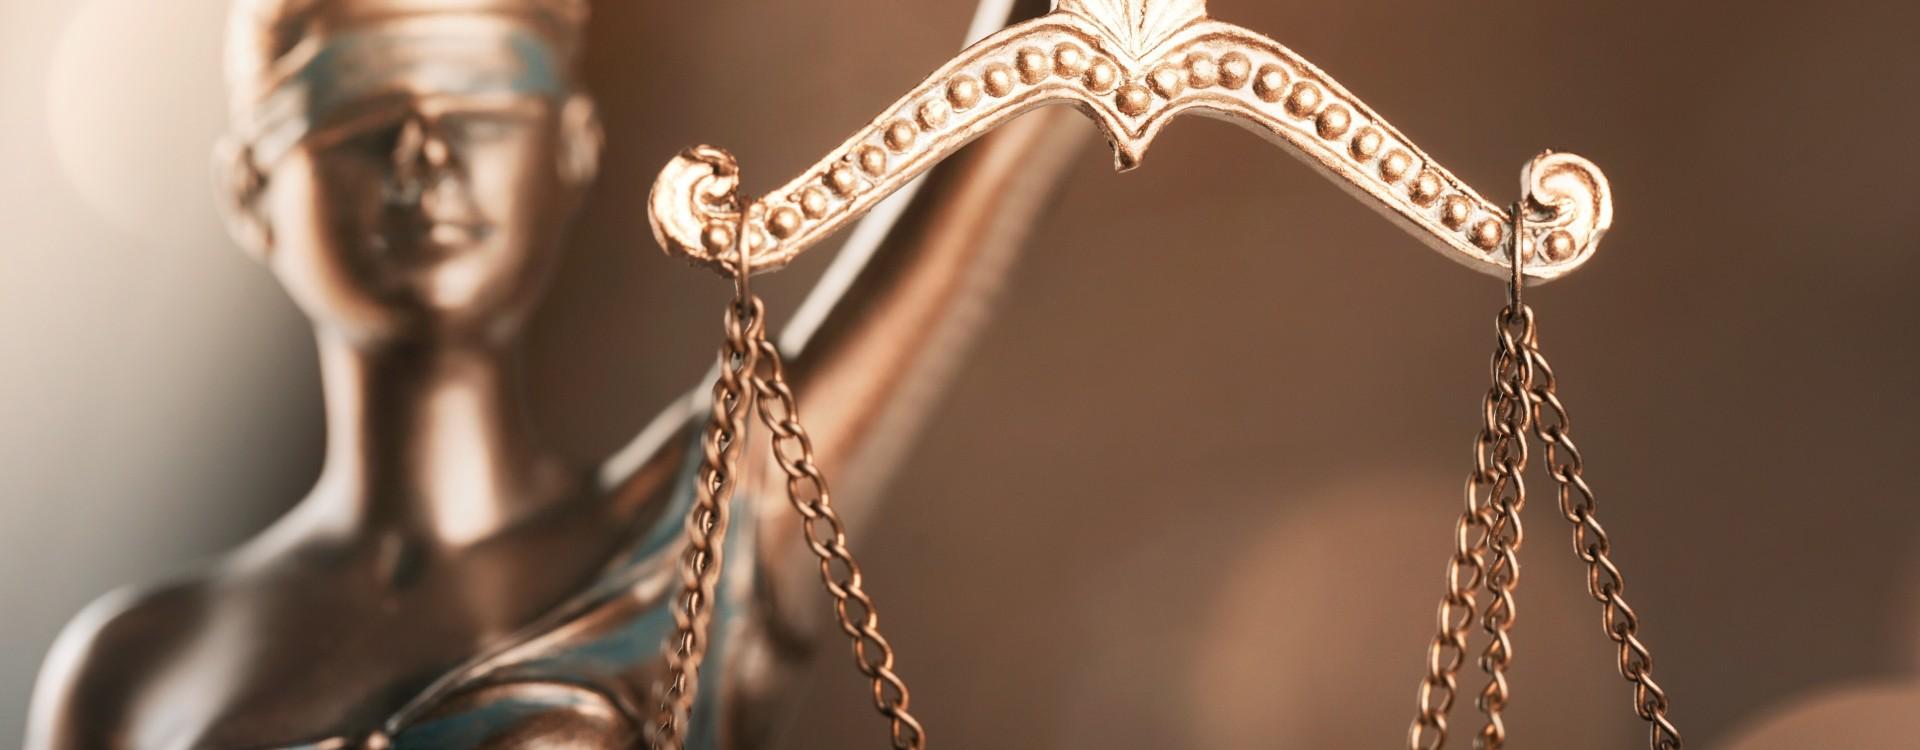 Seehofer erstreitet 33% Mehrwert gegen Skandia Lebensversicherung